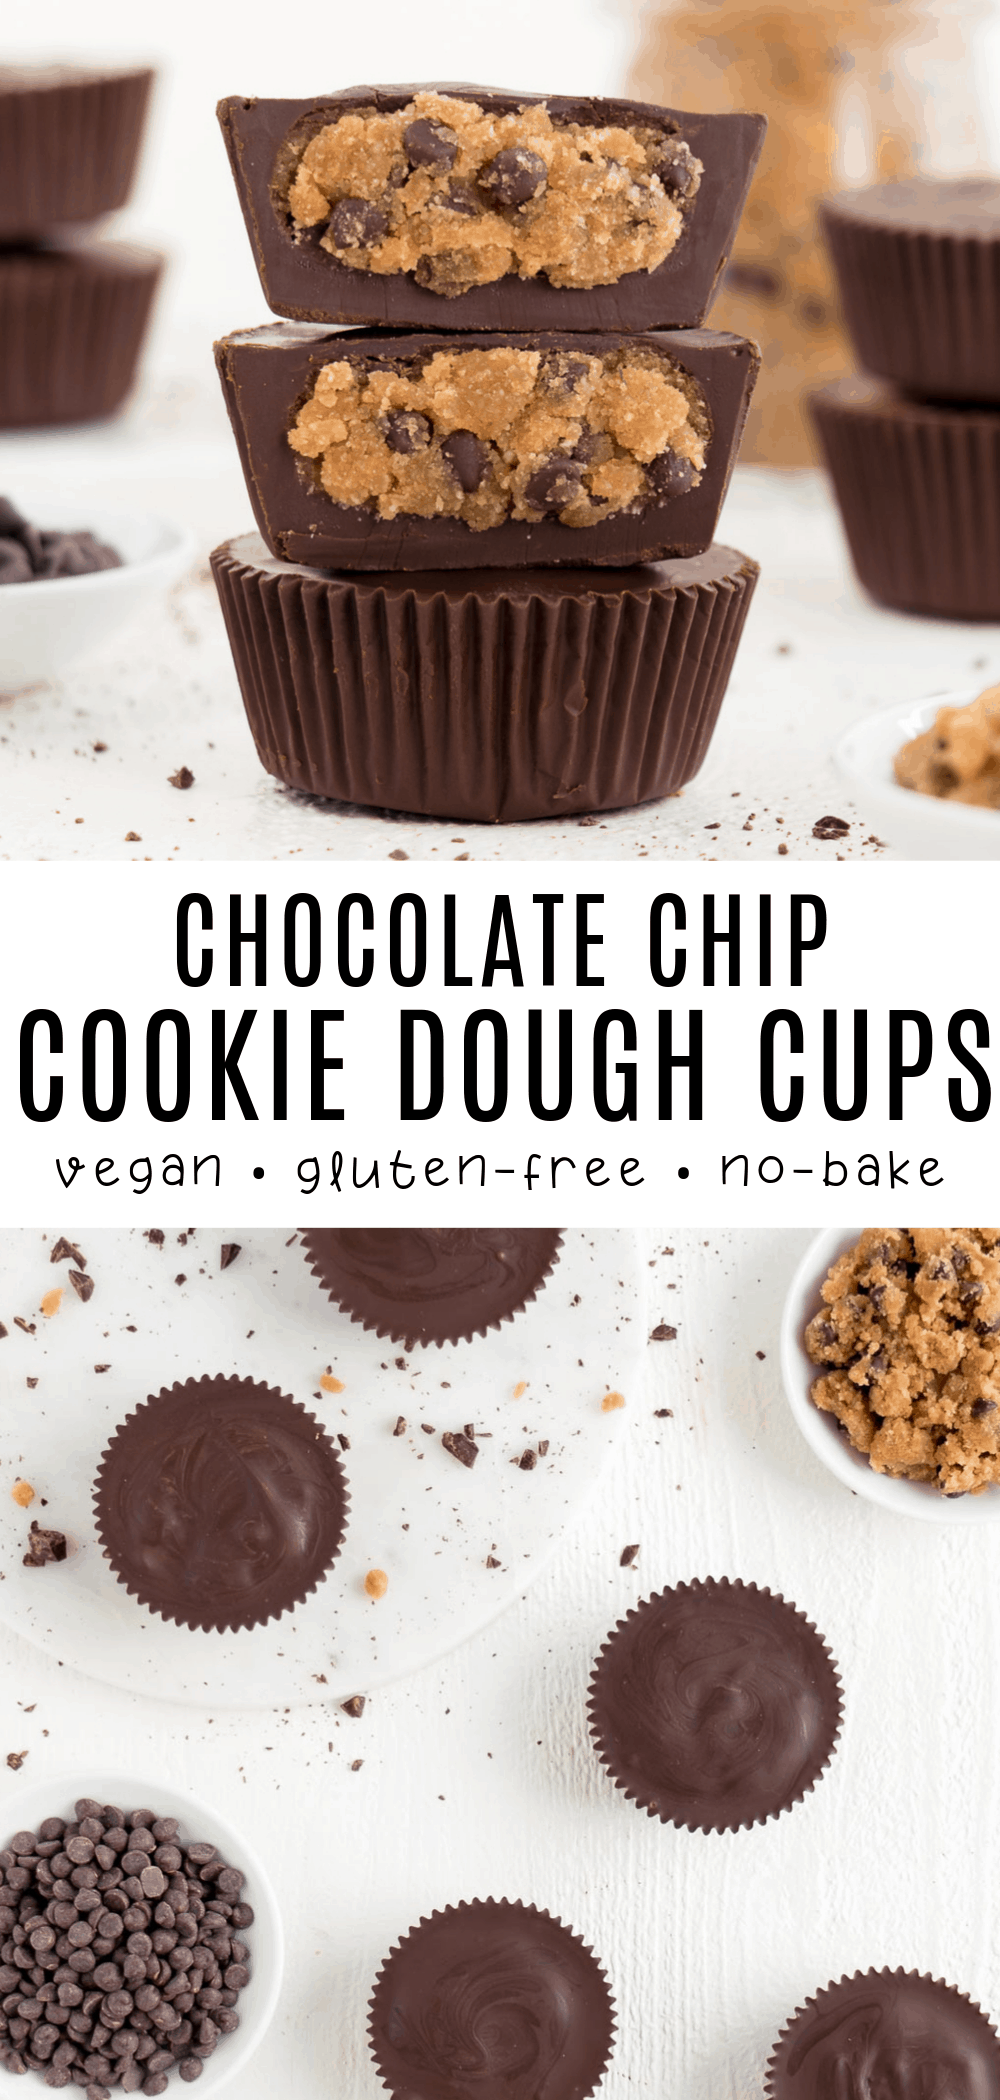 Vegan Chocolate Chip Cookie Dough Cups Recipe In 2020 Vegan Chocolate Chip Cookie Dough Vegan Chocolate Chip Cookies Chocolate Chip Cookies